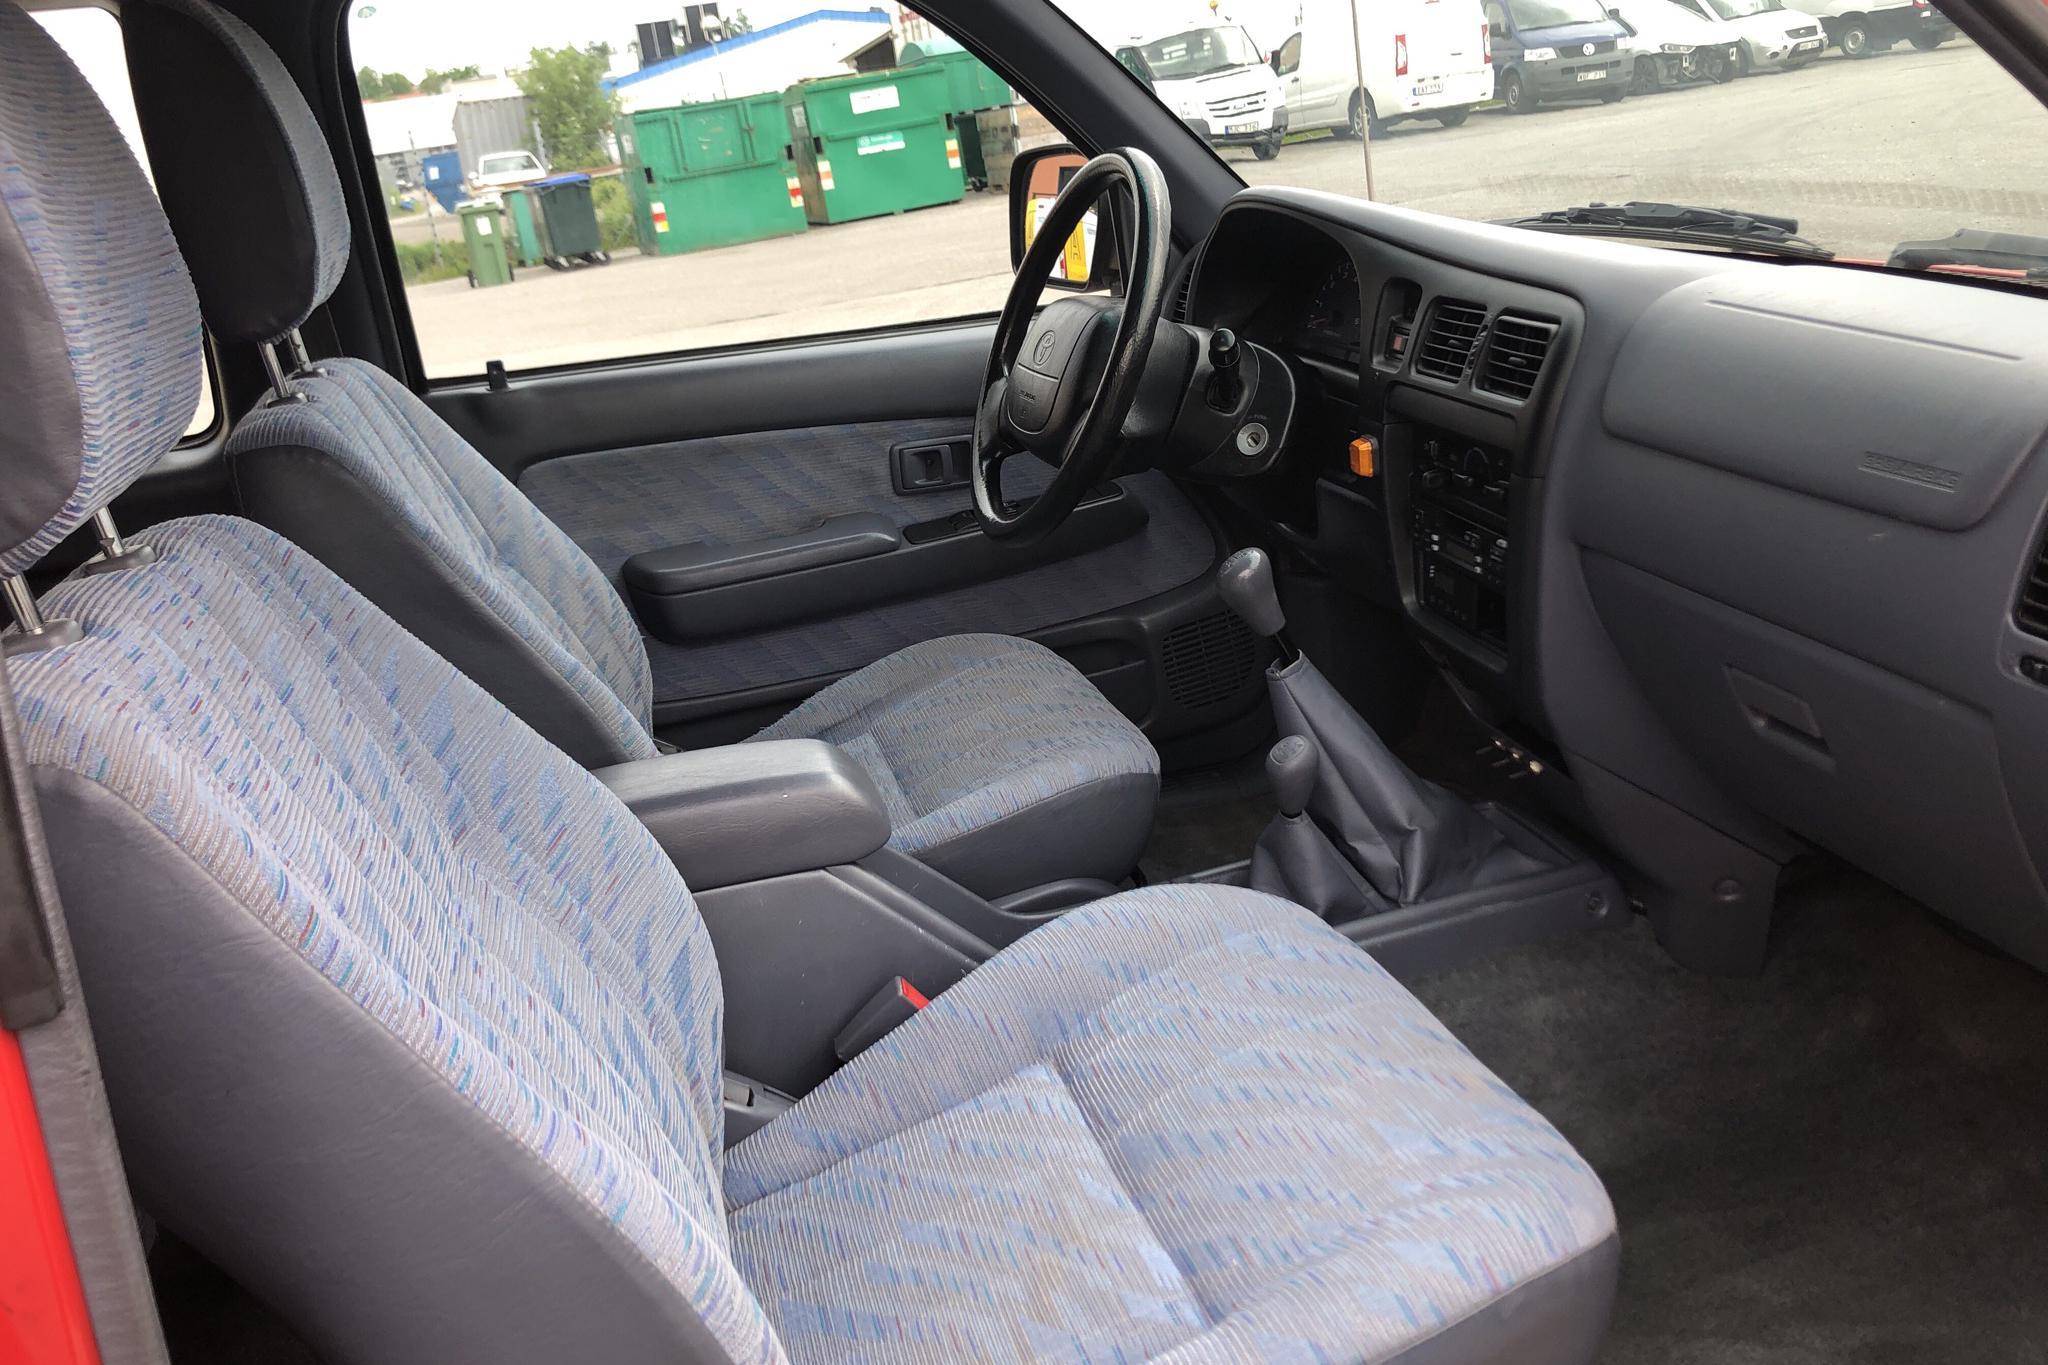 Toyota Hilux 2.4 4WD (140hk) - 12 874 mil - Manuell - röd - 2000